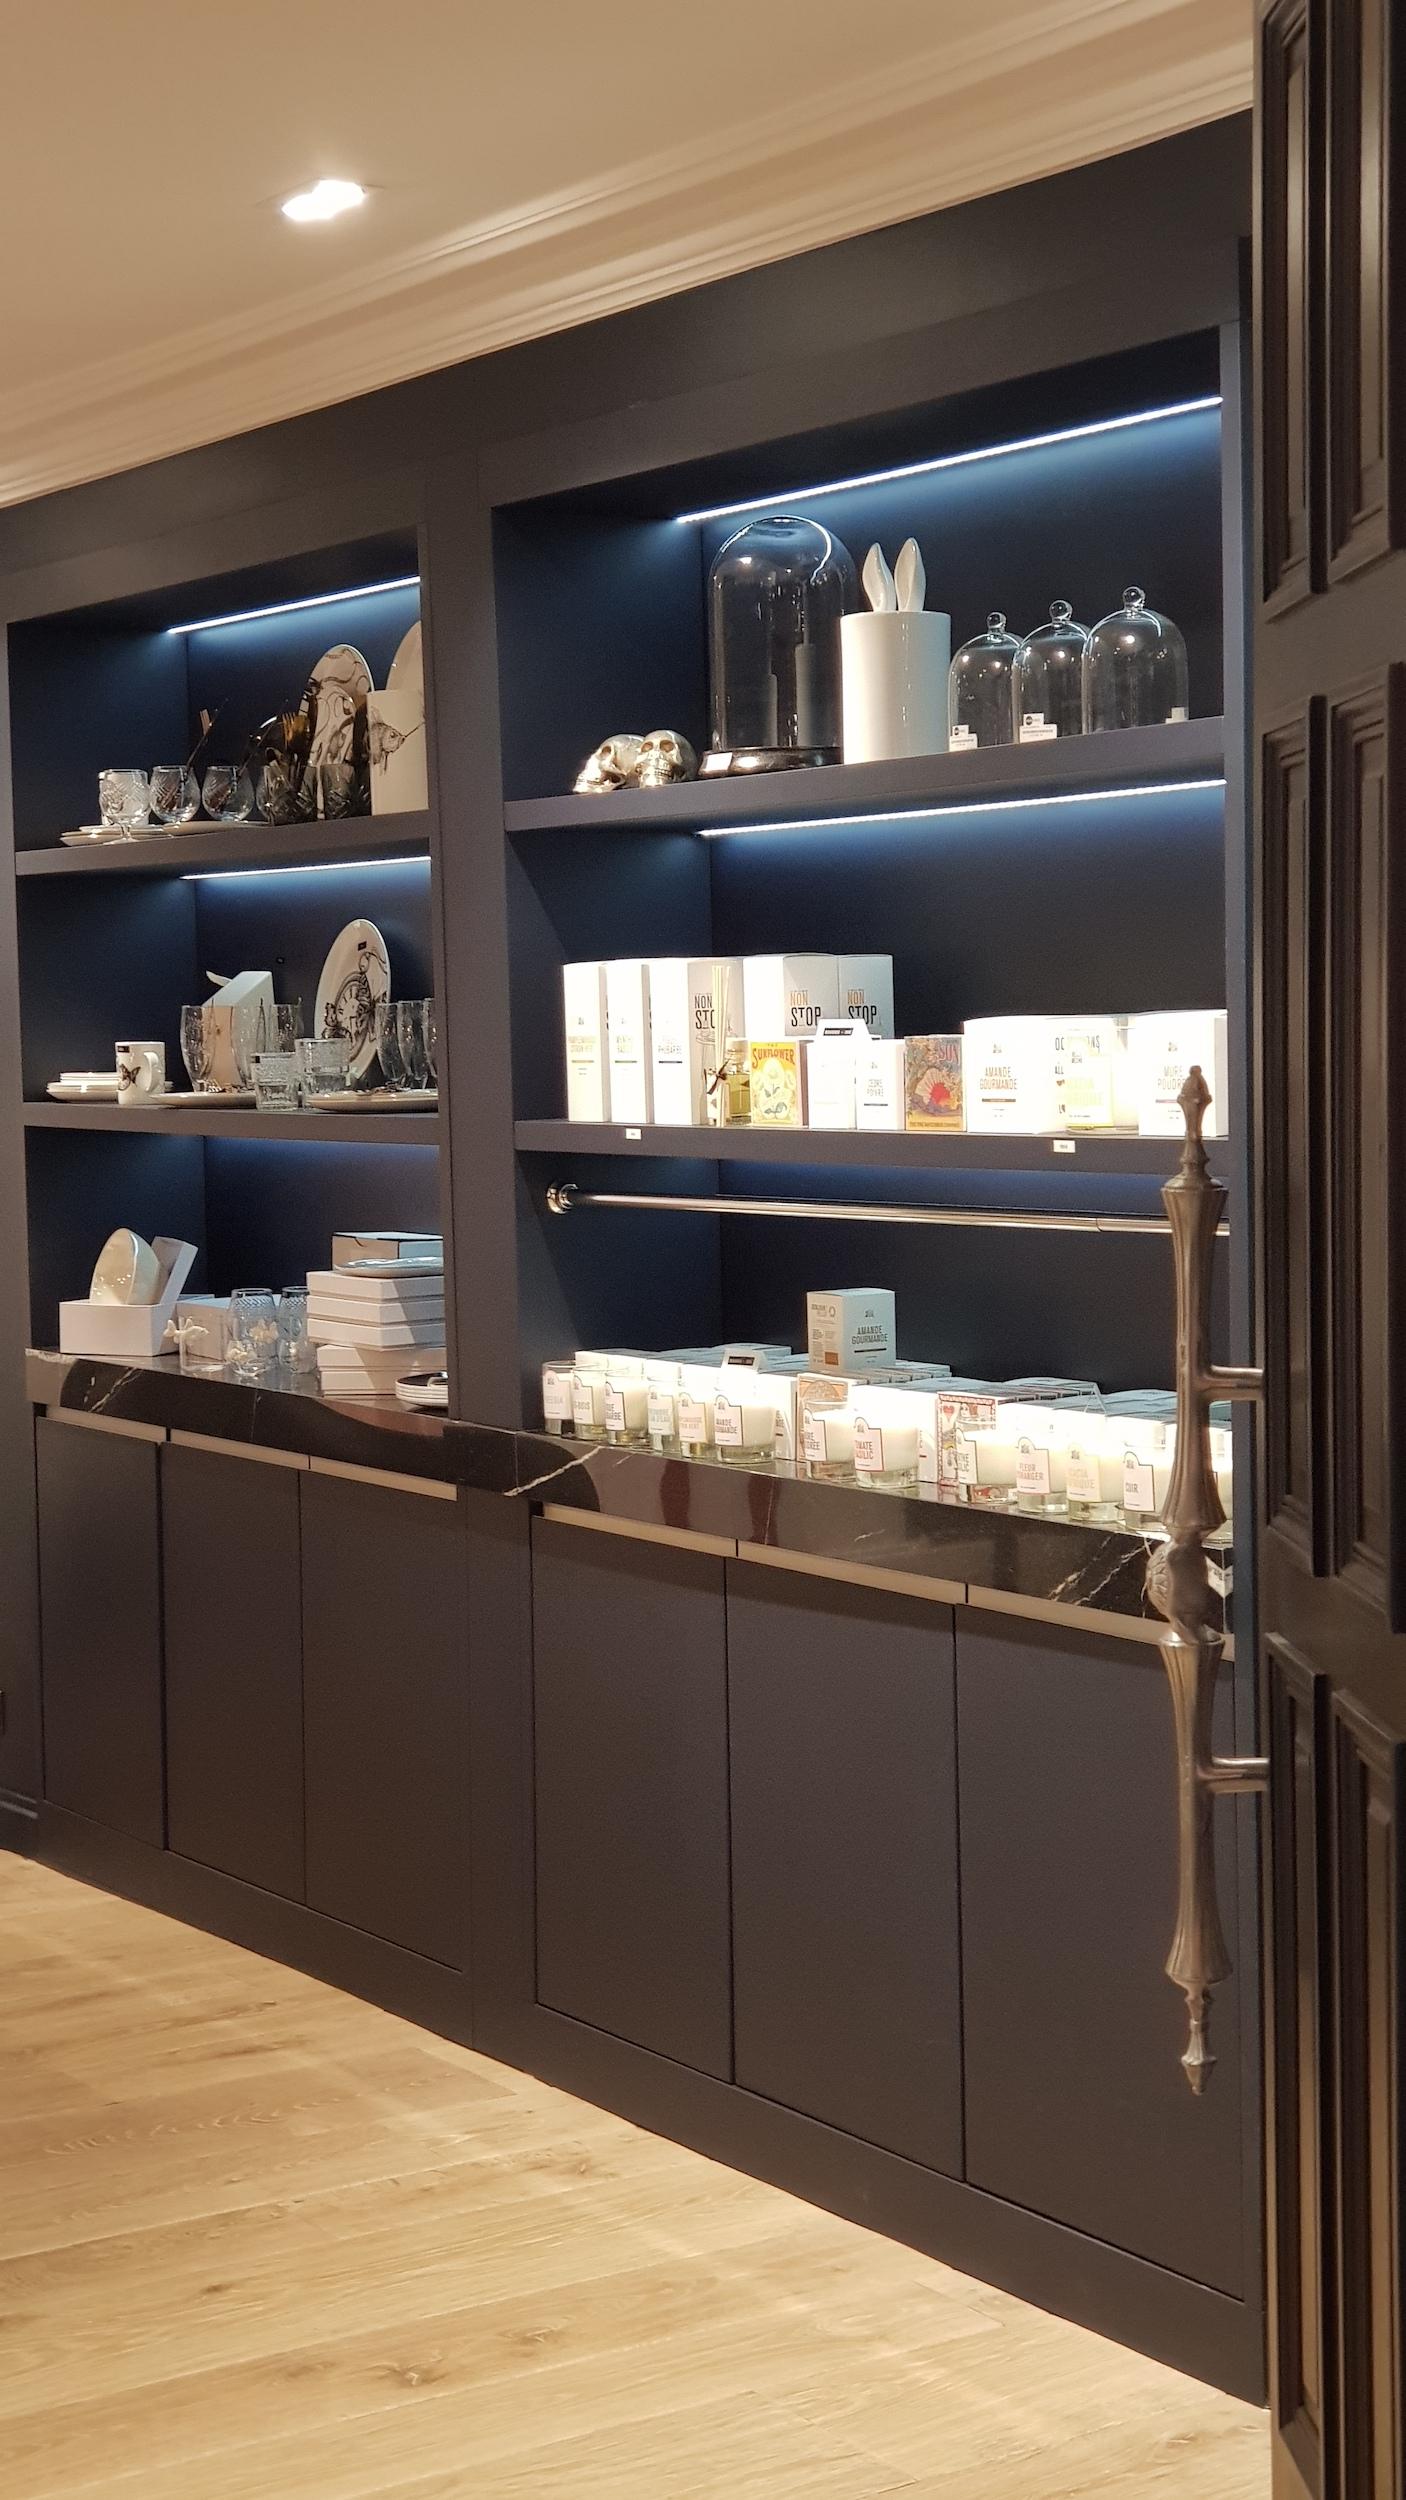 Renovation-boutique-decoration-lagny-77-carre-7-original